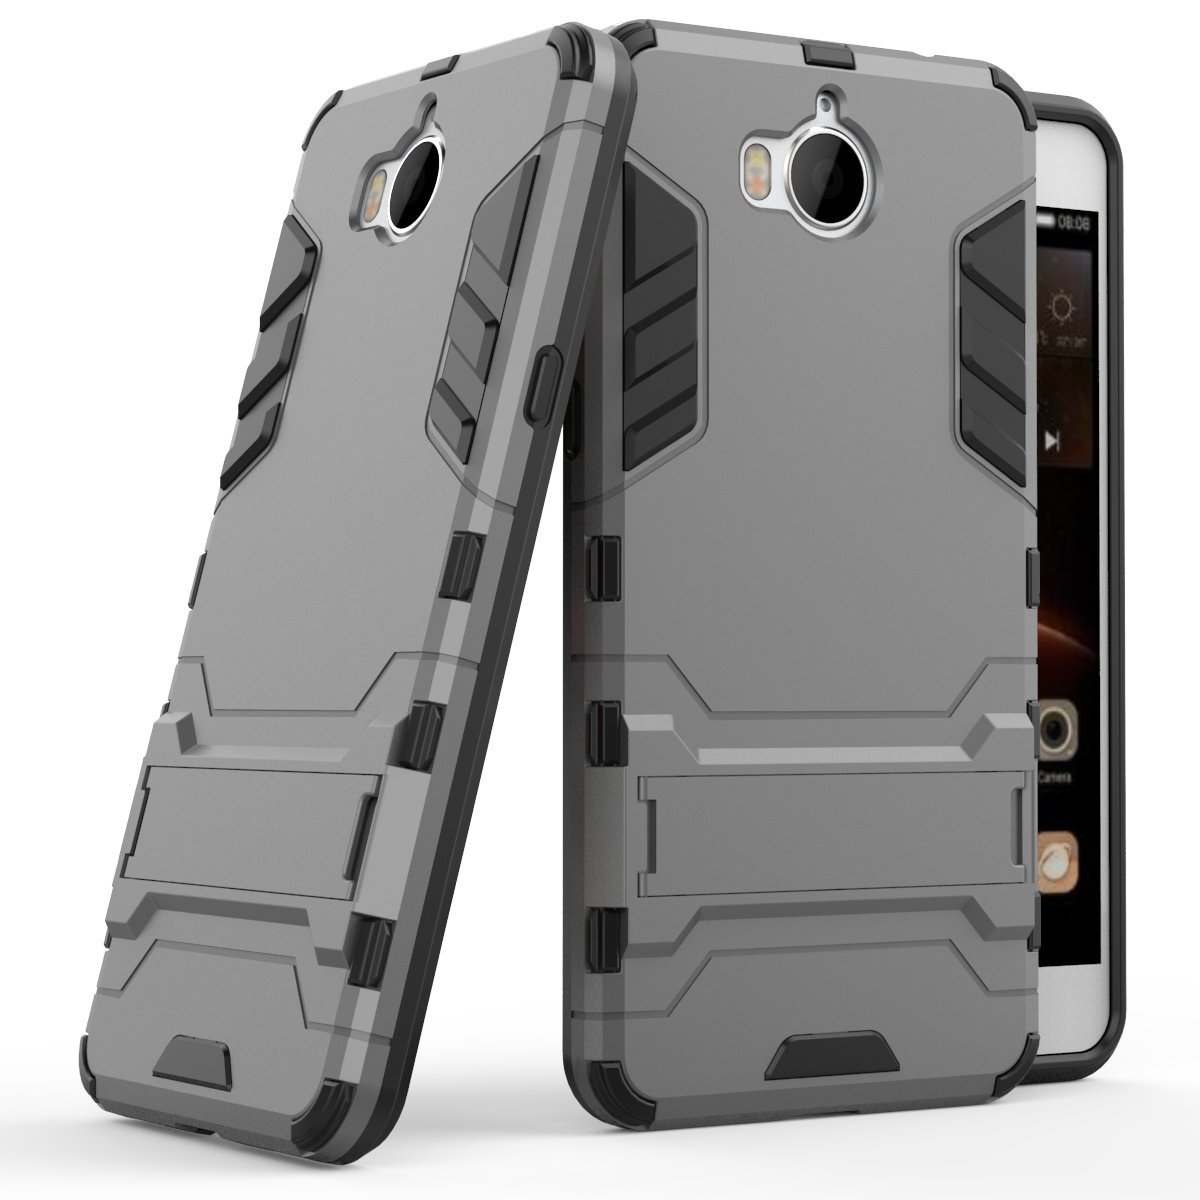 Huawei Y Funda SMTR Ultra Silm Híbrida Rugged Armor Case Choque Absorción